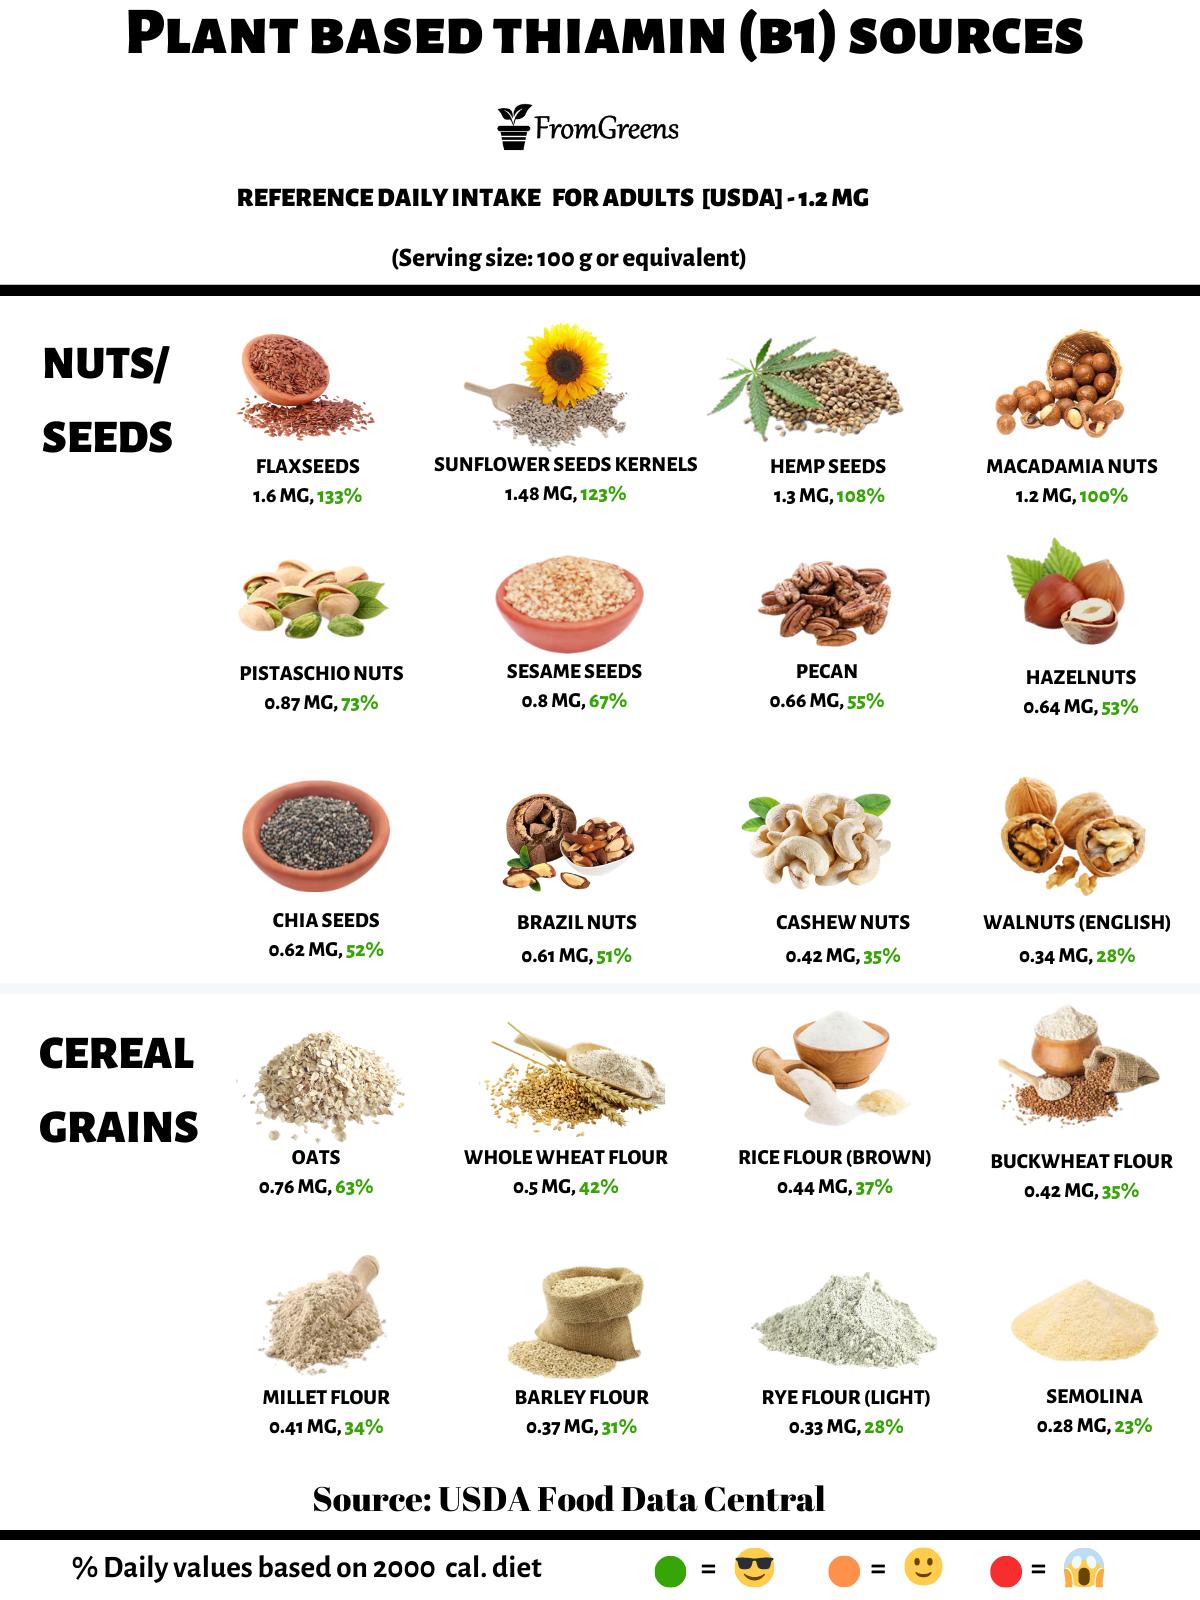 foods high in vitamin b1 thiamine